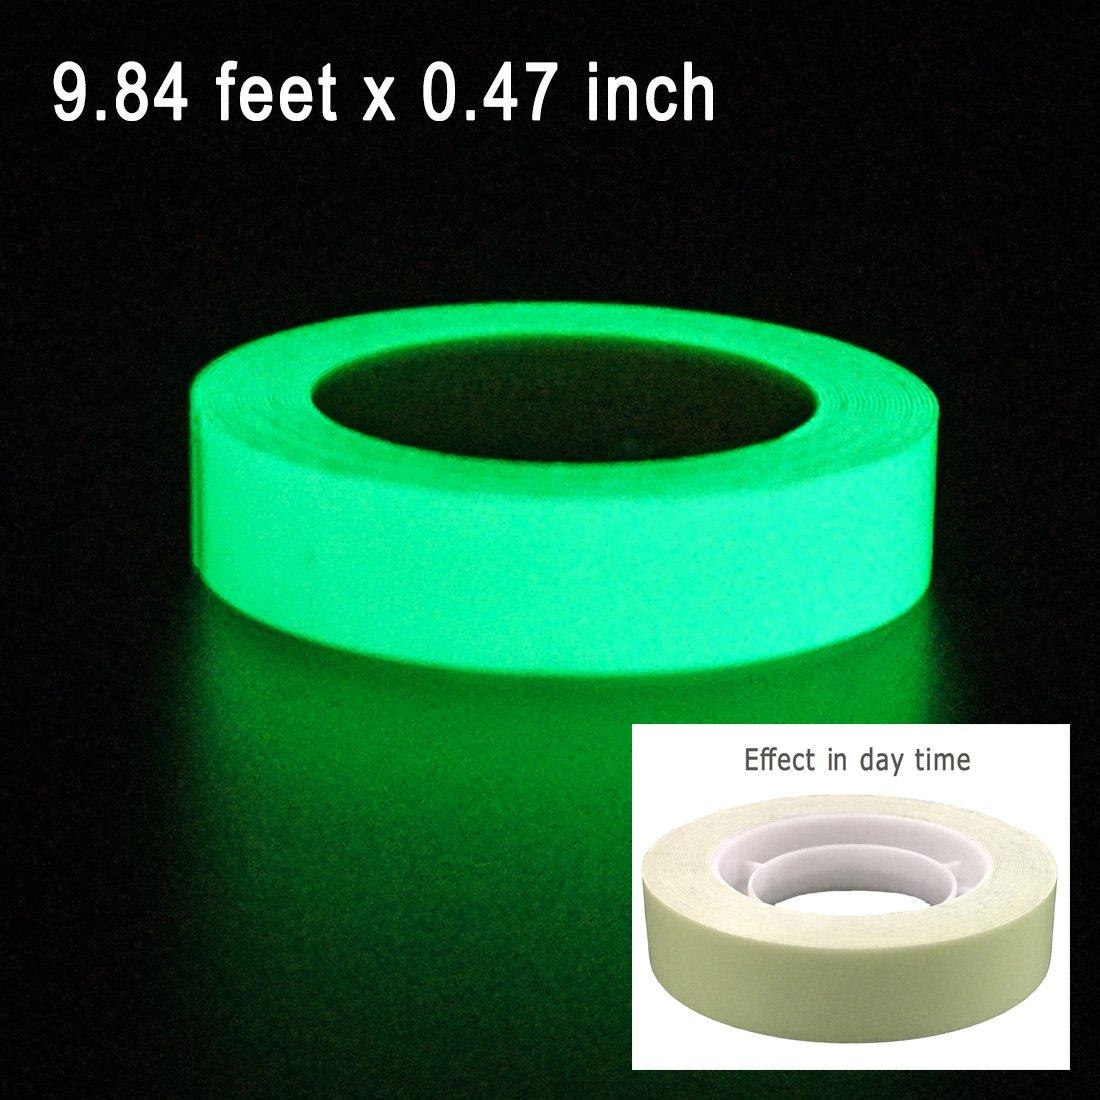 "DUOFIRE Luminous Tape Sticker,9.84' Length x 0.47"" Width (1.2cm3m) High Luminance Glow Removable Waterproof Photoluminescent Glow in The Dark Safety Tape (Size-No.5)"